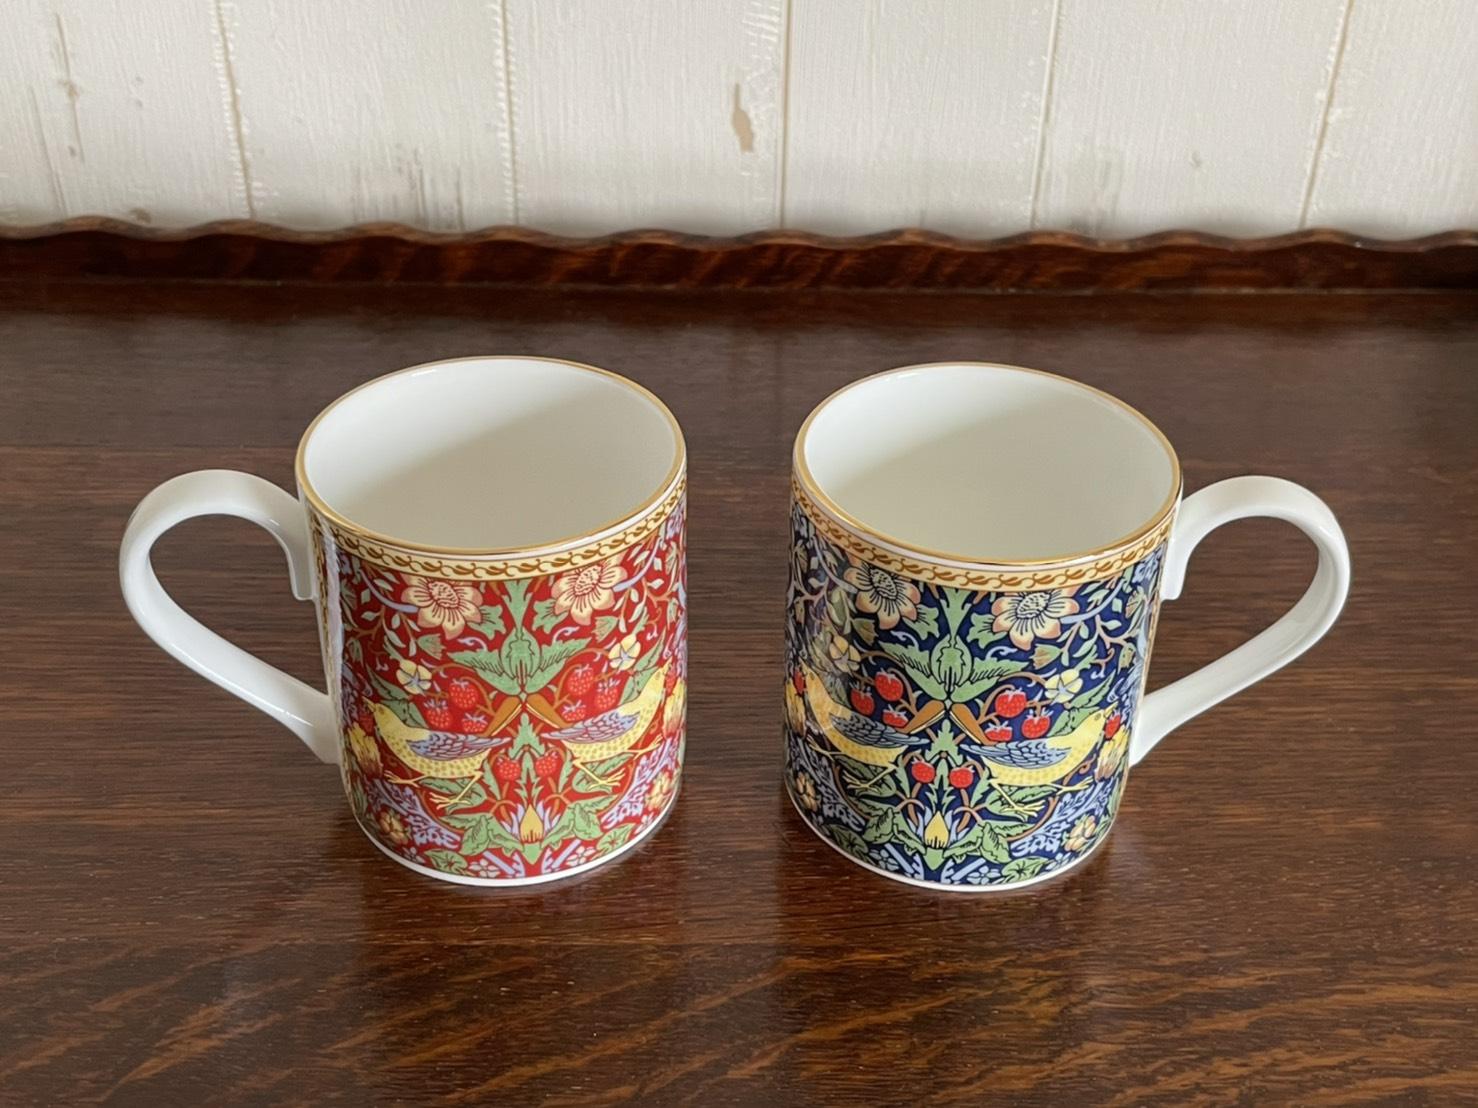 WILLIAM MORRIS MUG & TANKARD MUG 英国製のマグカップ